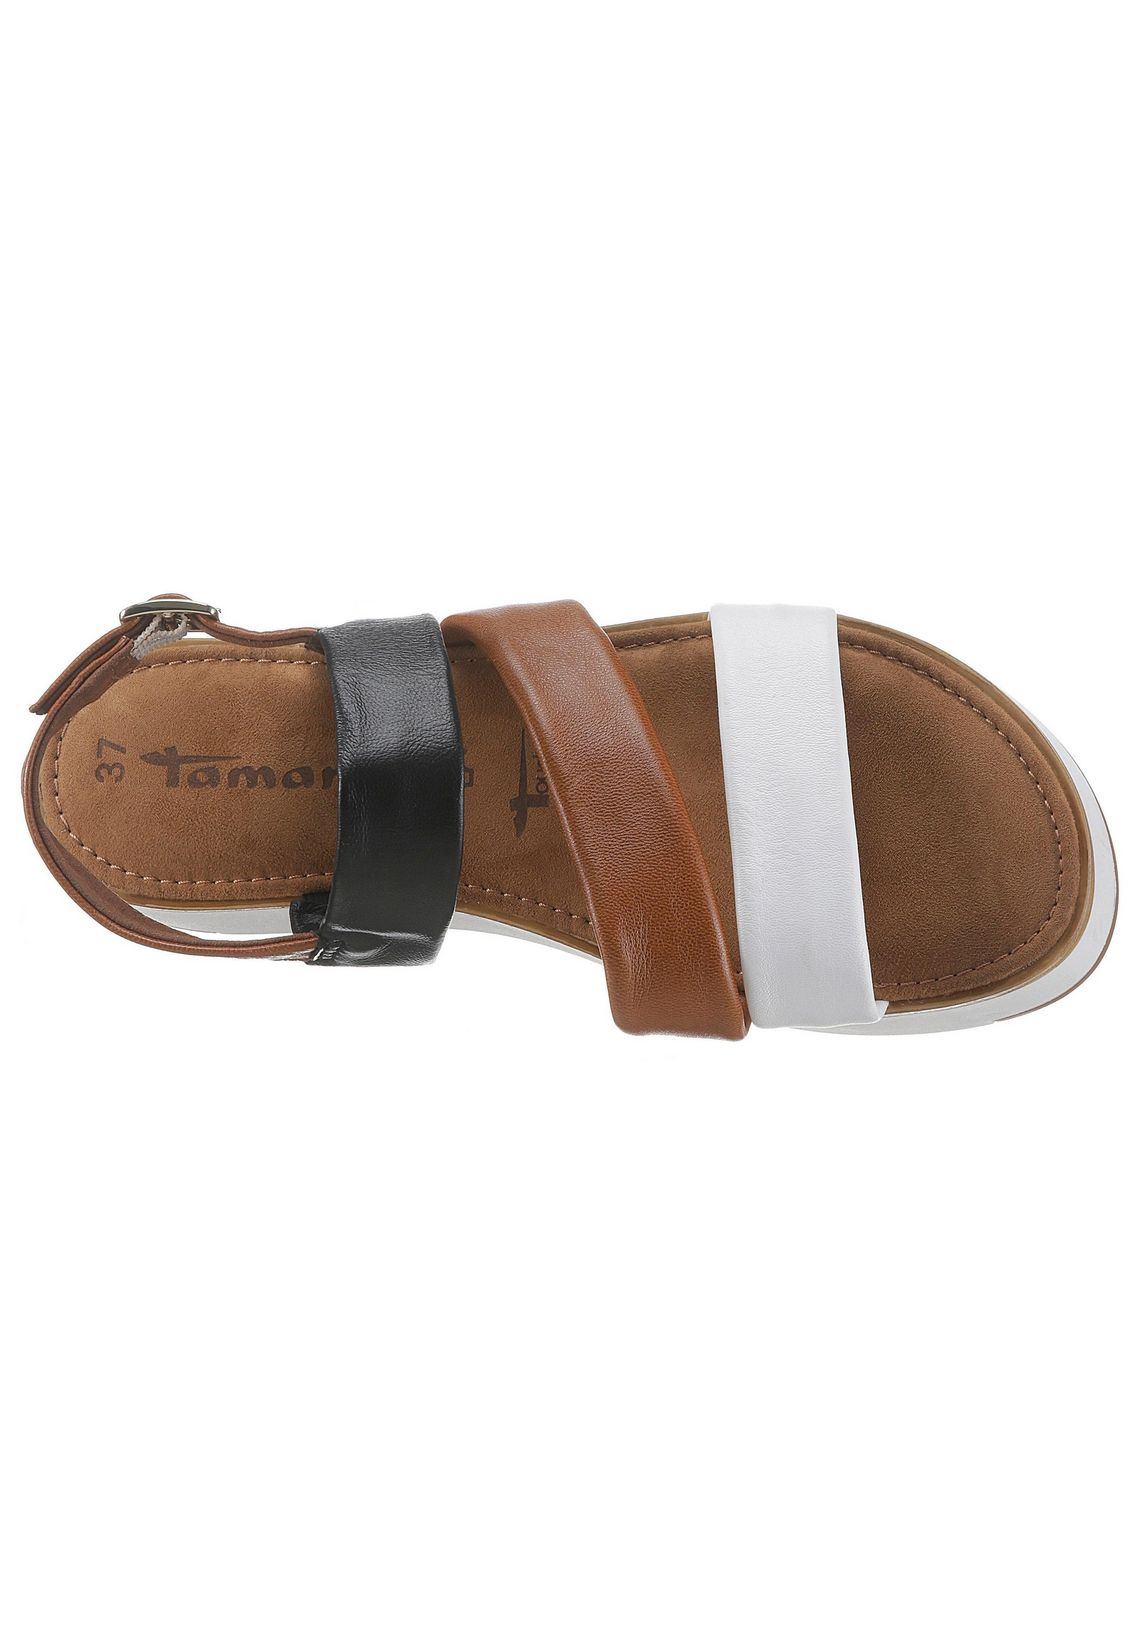 Tamaris plateausandalen online shop  bruin/wit/zwart